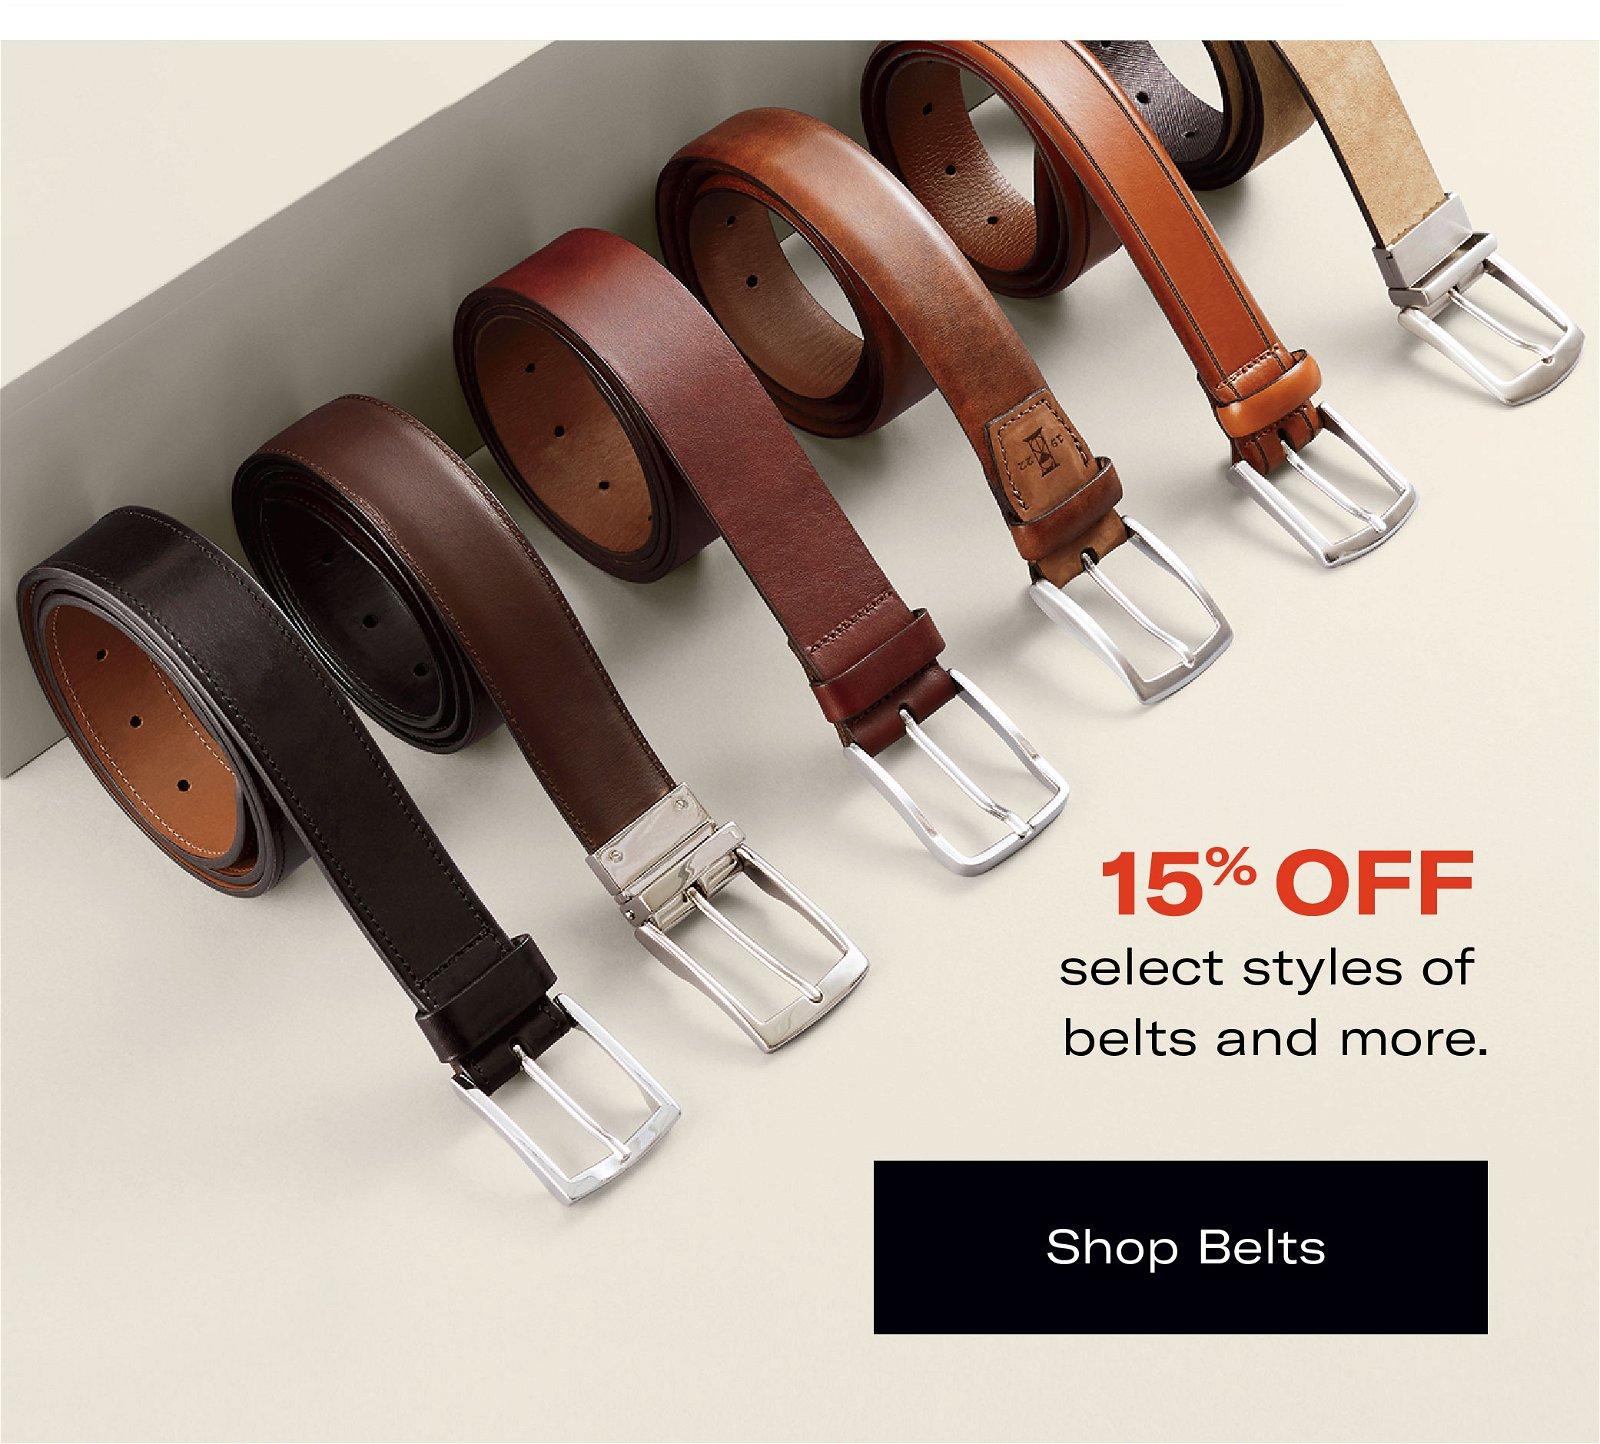 Save 15% on Belts